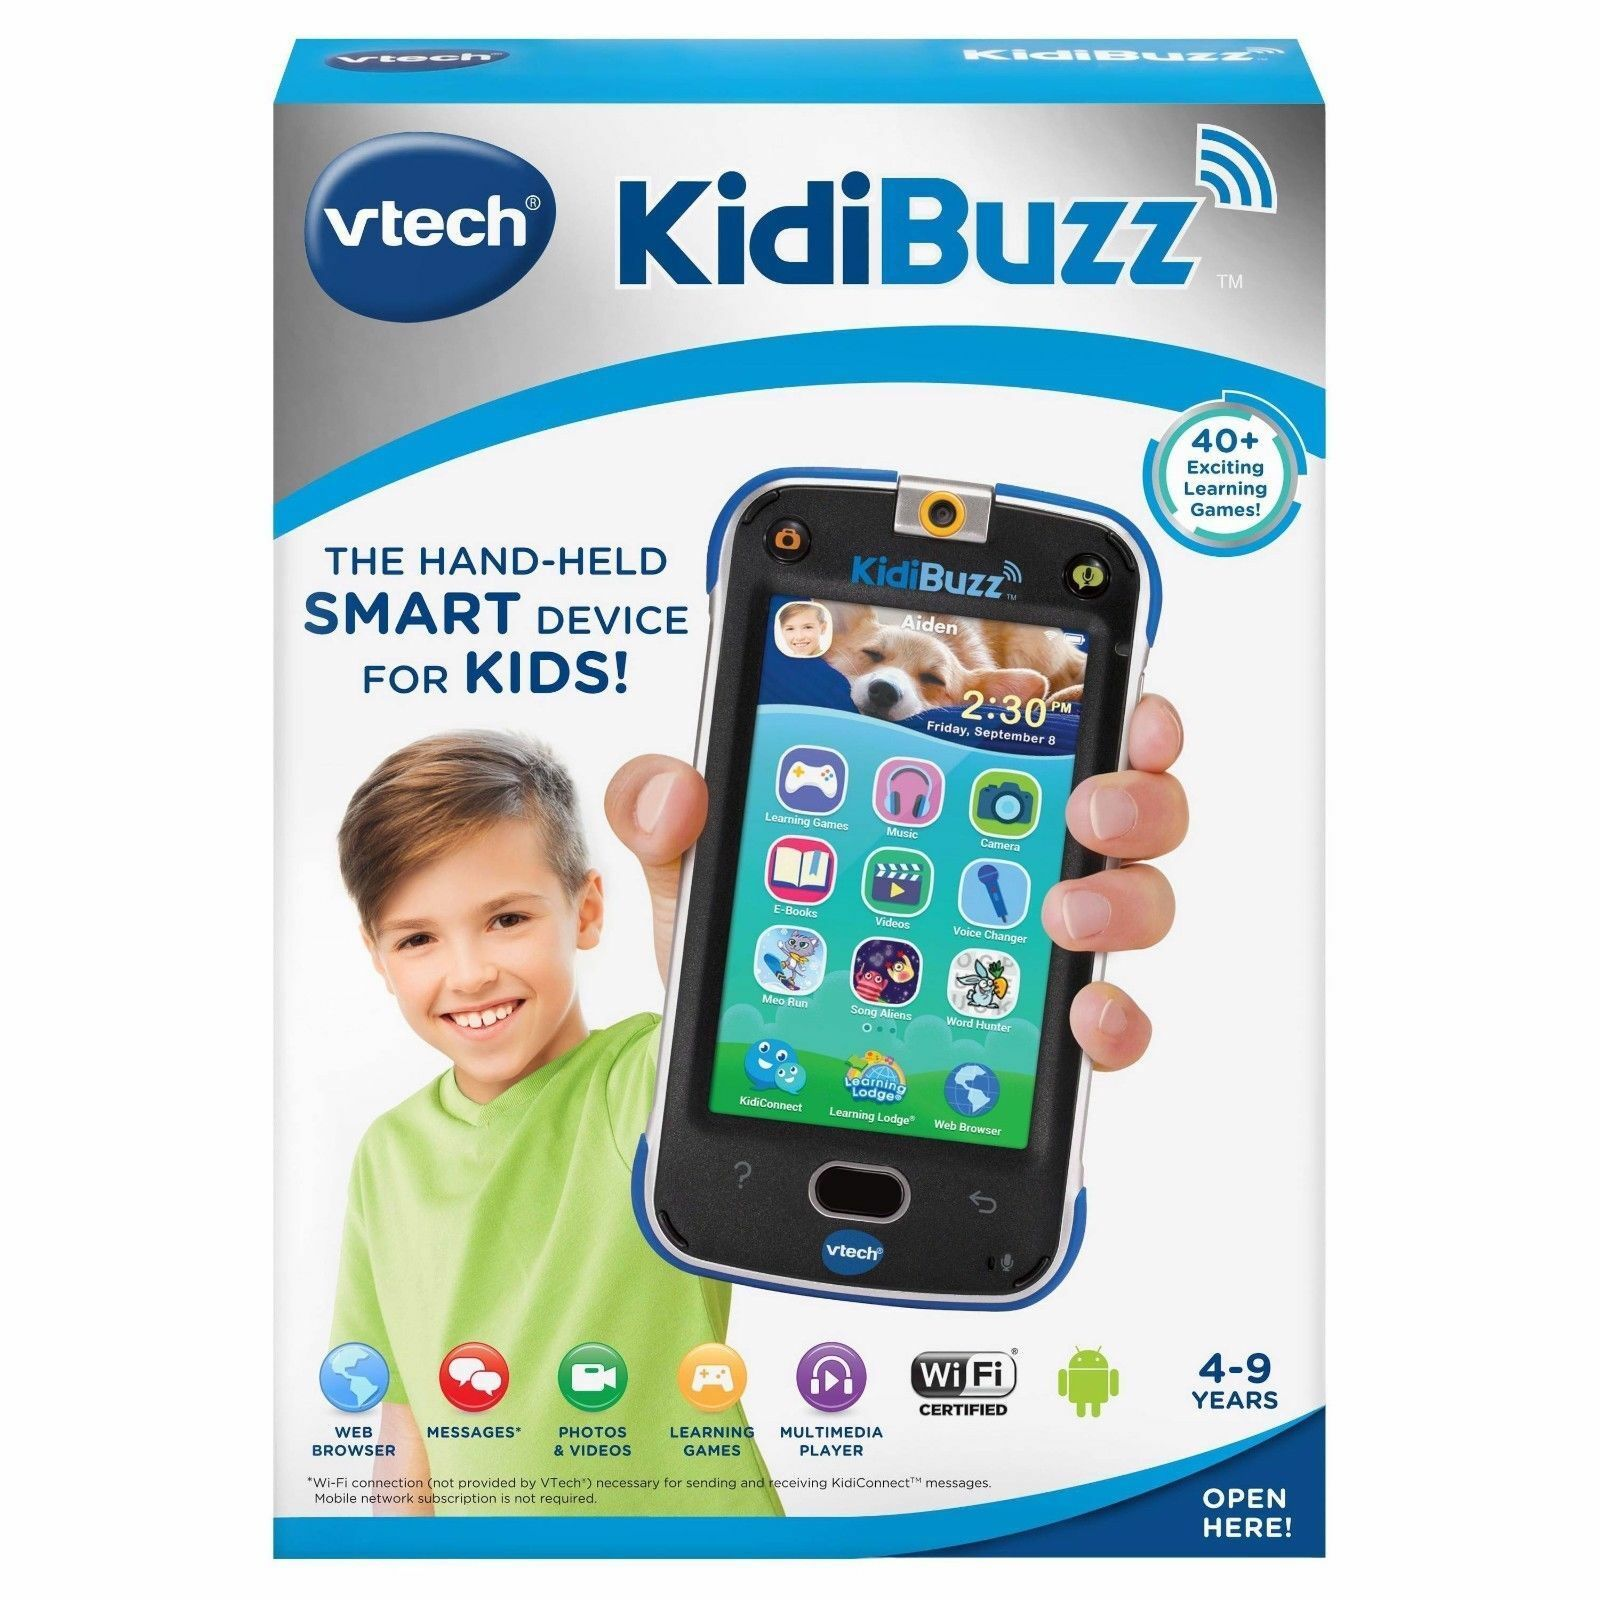 VTech KidiBuzz Hand-Held Smart Device blueE  Real Phone For Kids